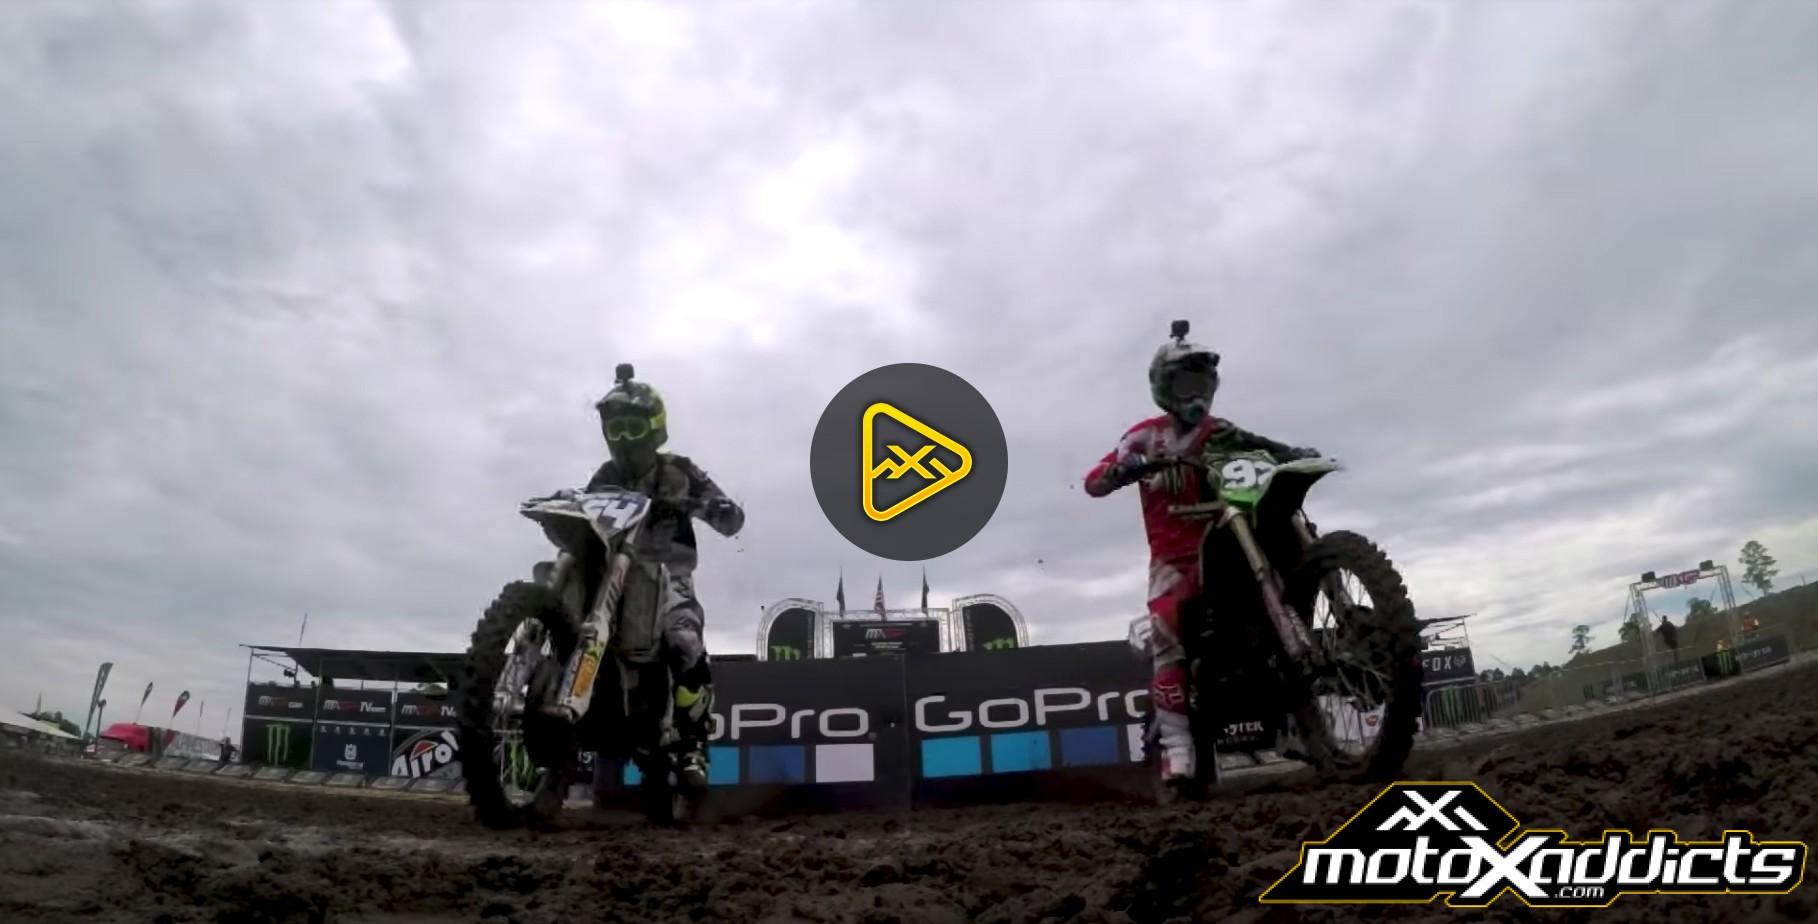 Helmet Cam: Covington & Cianciarulo – 2017 MXGP of USA